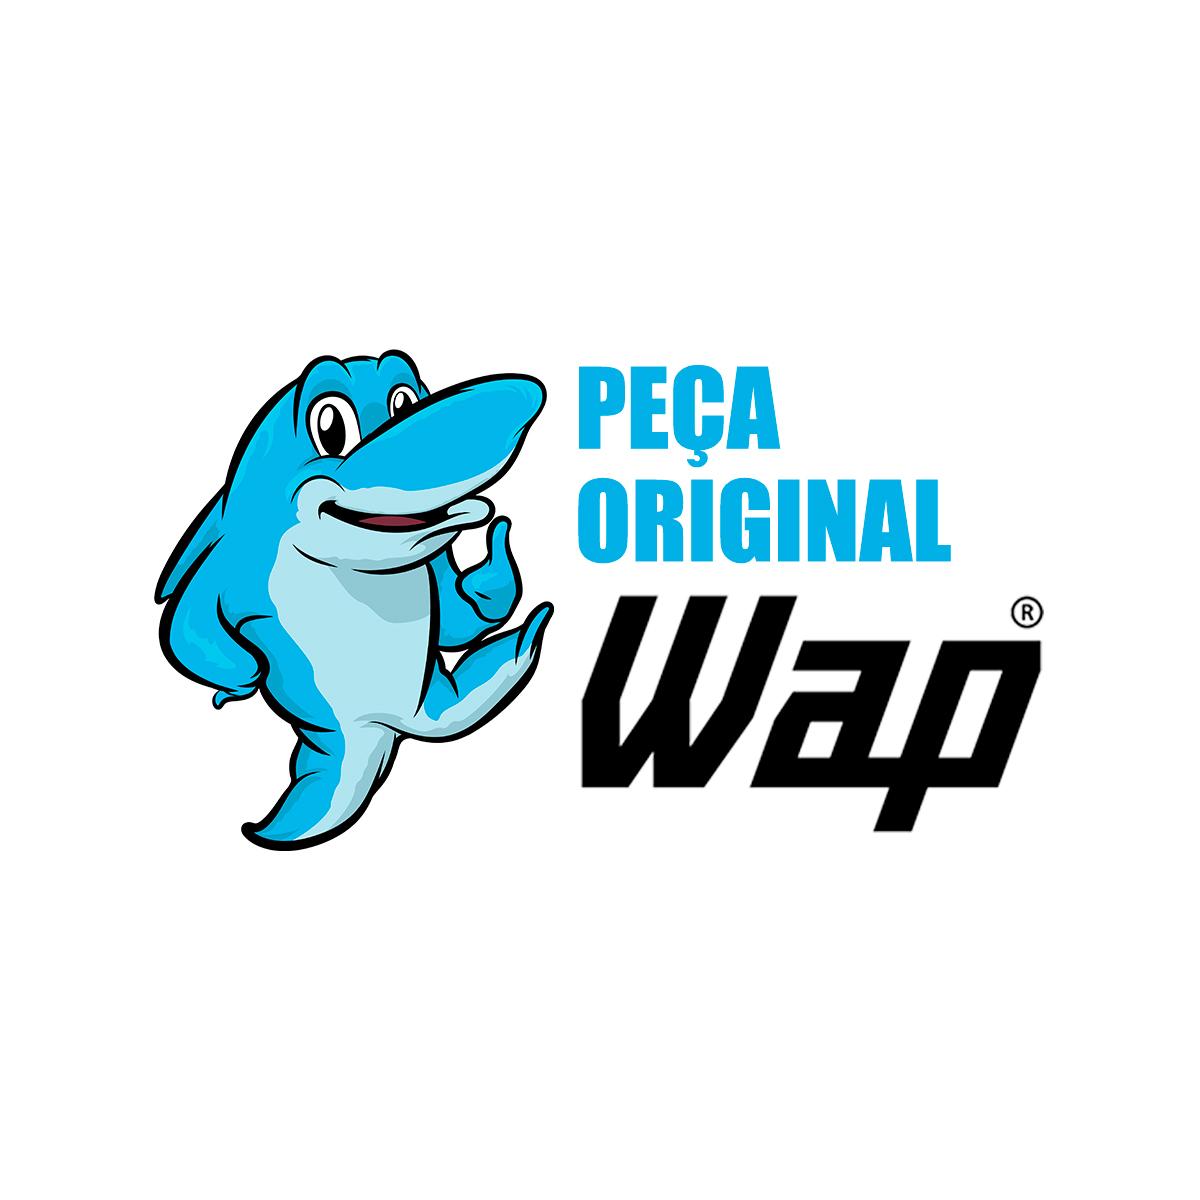 Kit Reparo para Lavadora Wap Valente, Bravo, Premium, 4100, Atacama, Eco Wash 15pcs Original